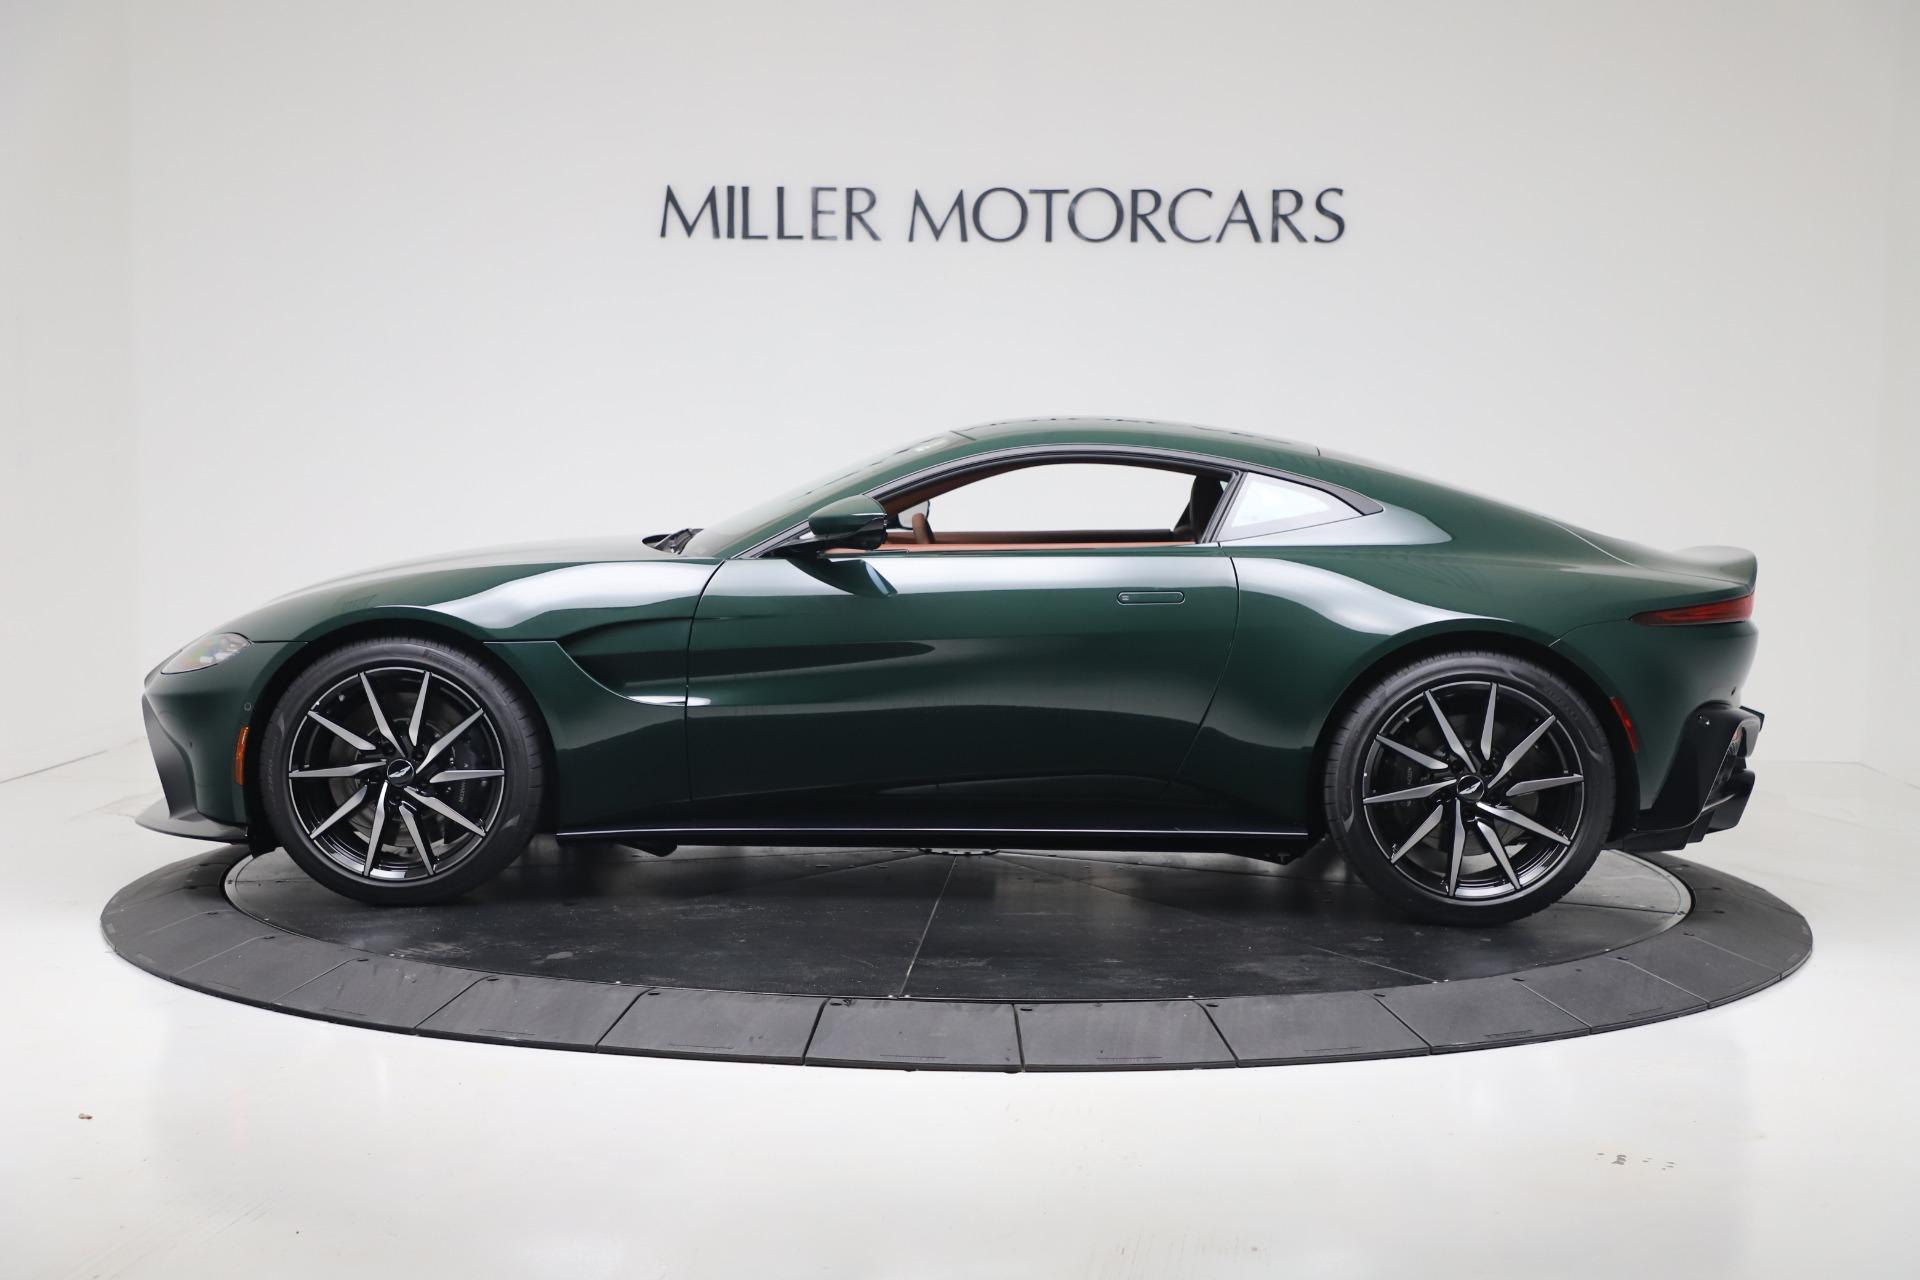 New 2020 Aston Martin Vantage V8 For Sale In Westport, CT 3483_p12